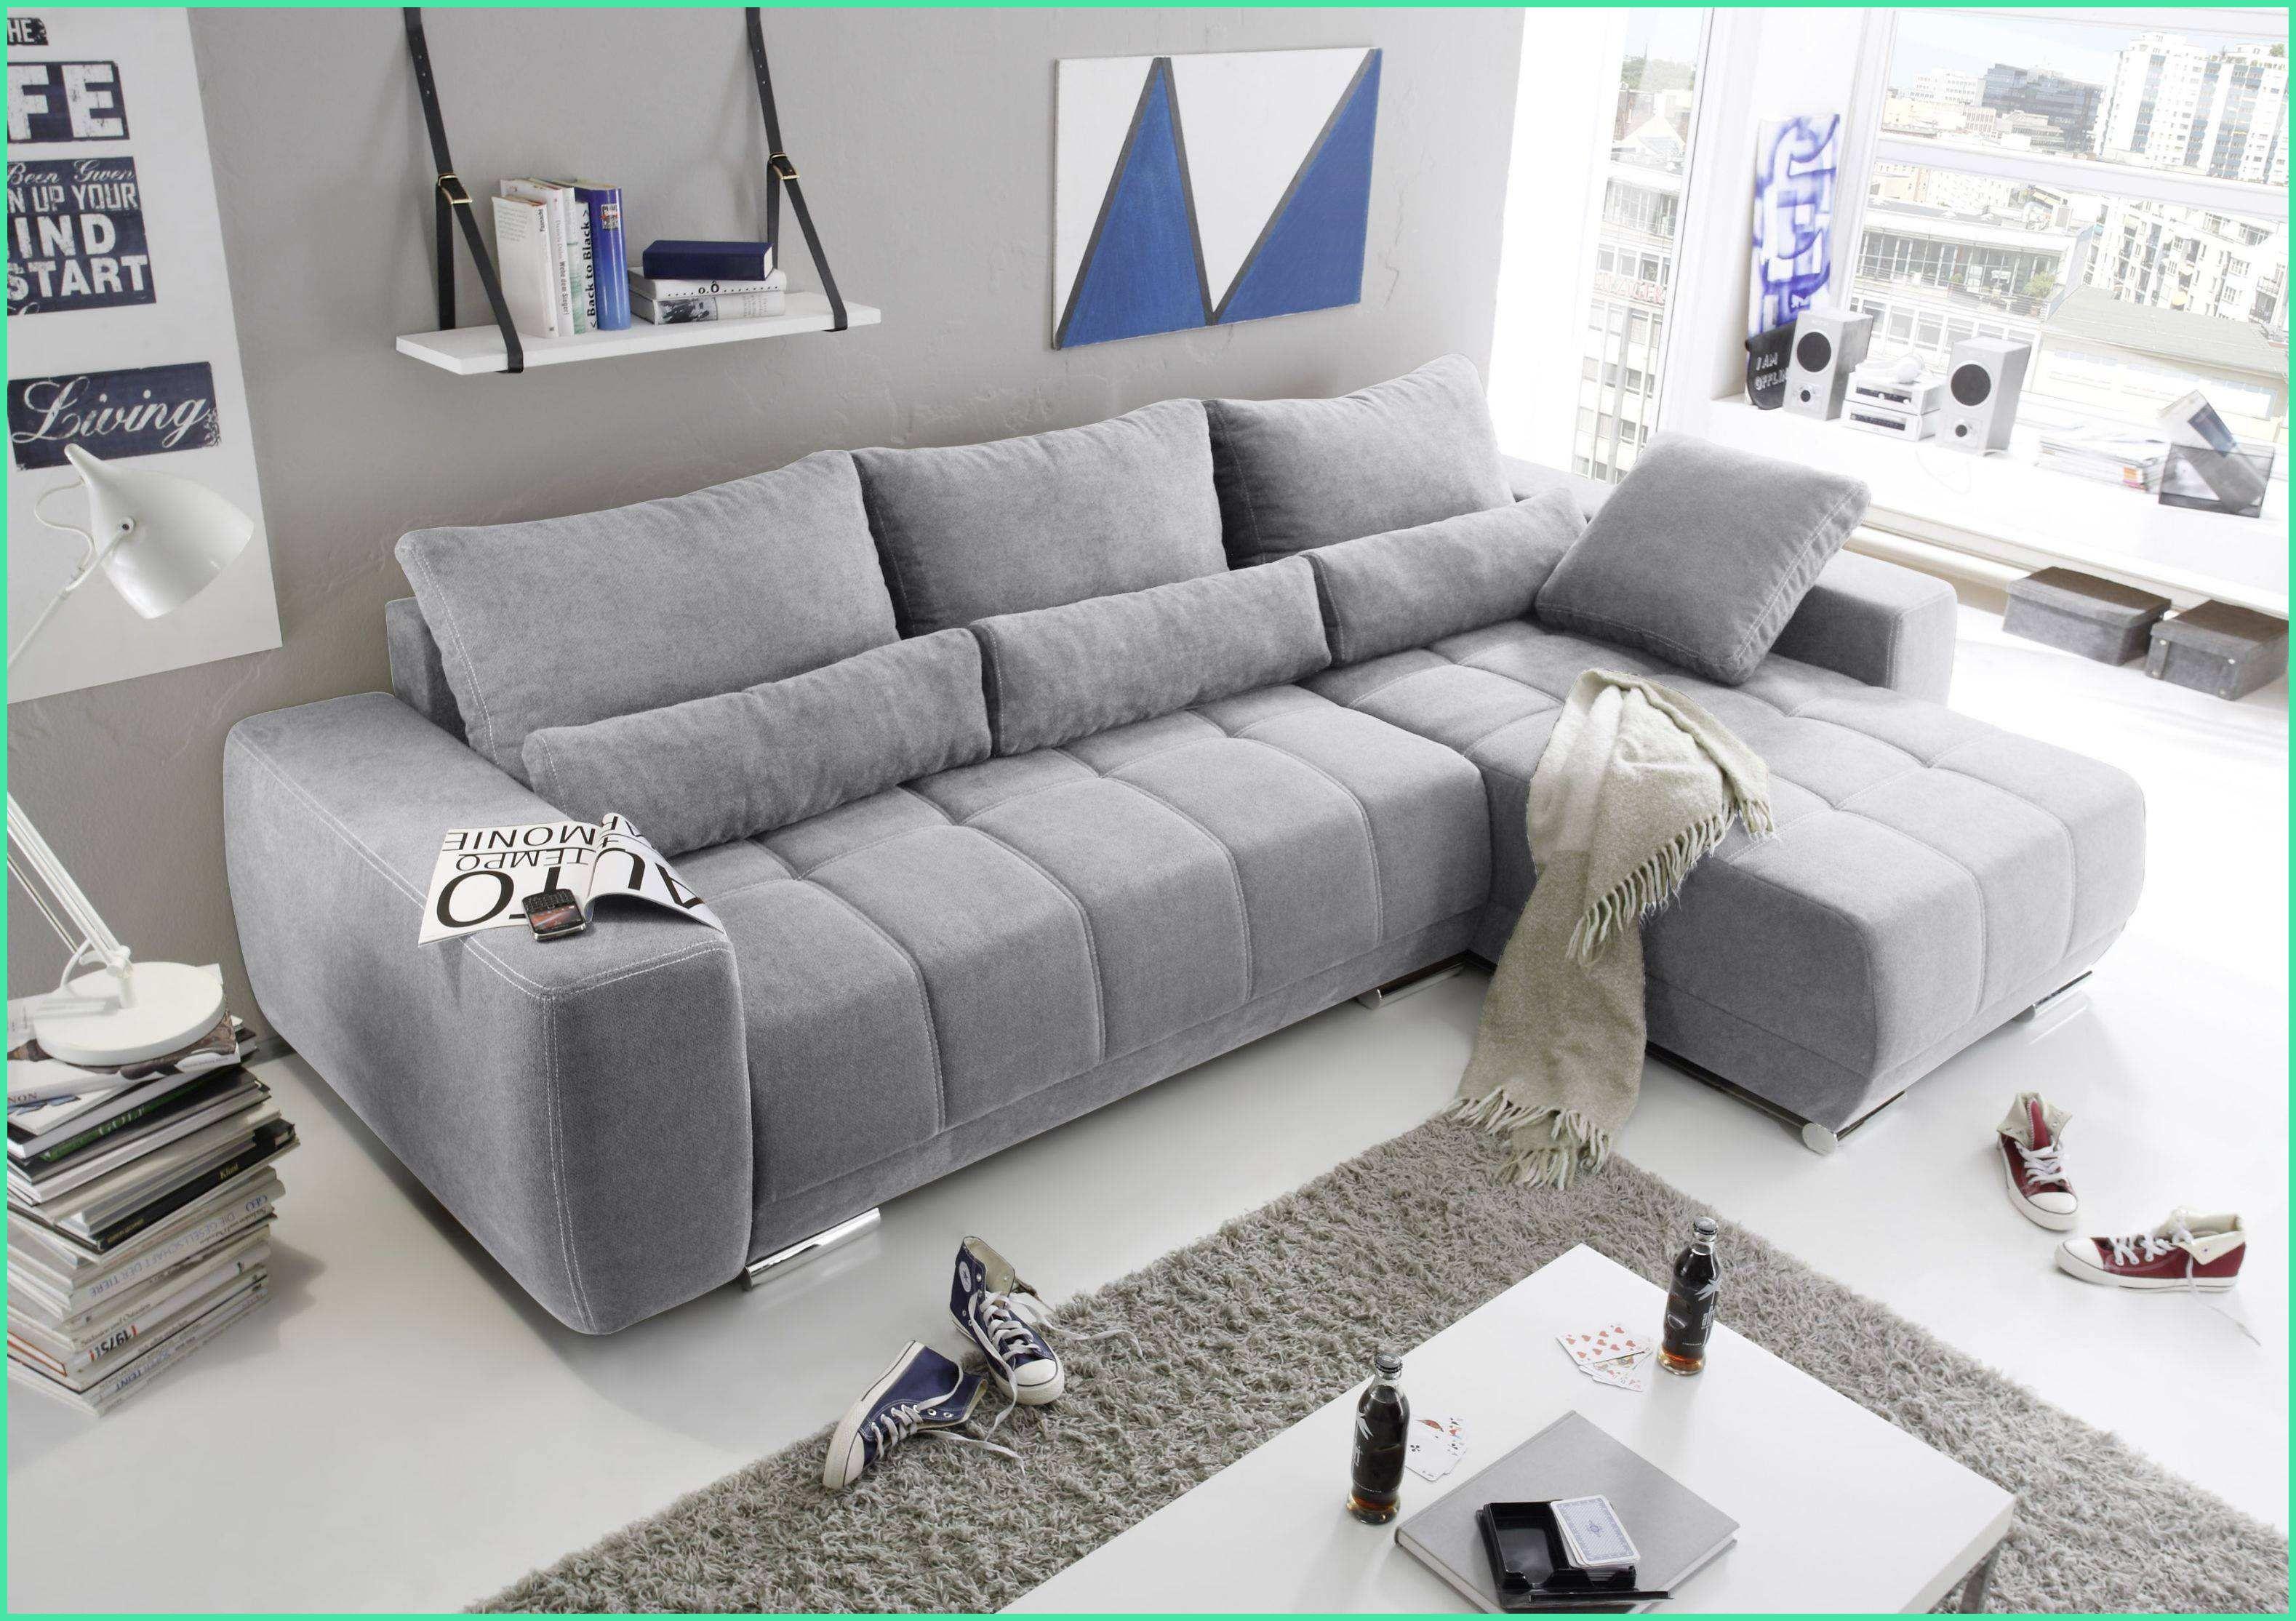 Ecksofa Ausziehbar New Sofa Funfsitzer Ecksofa Nicht Ausziehbar